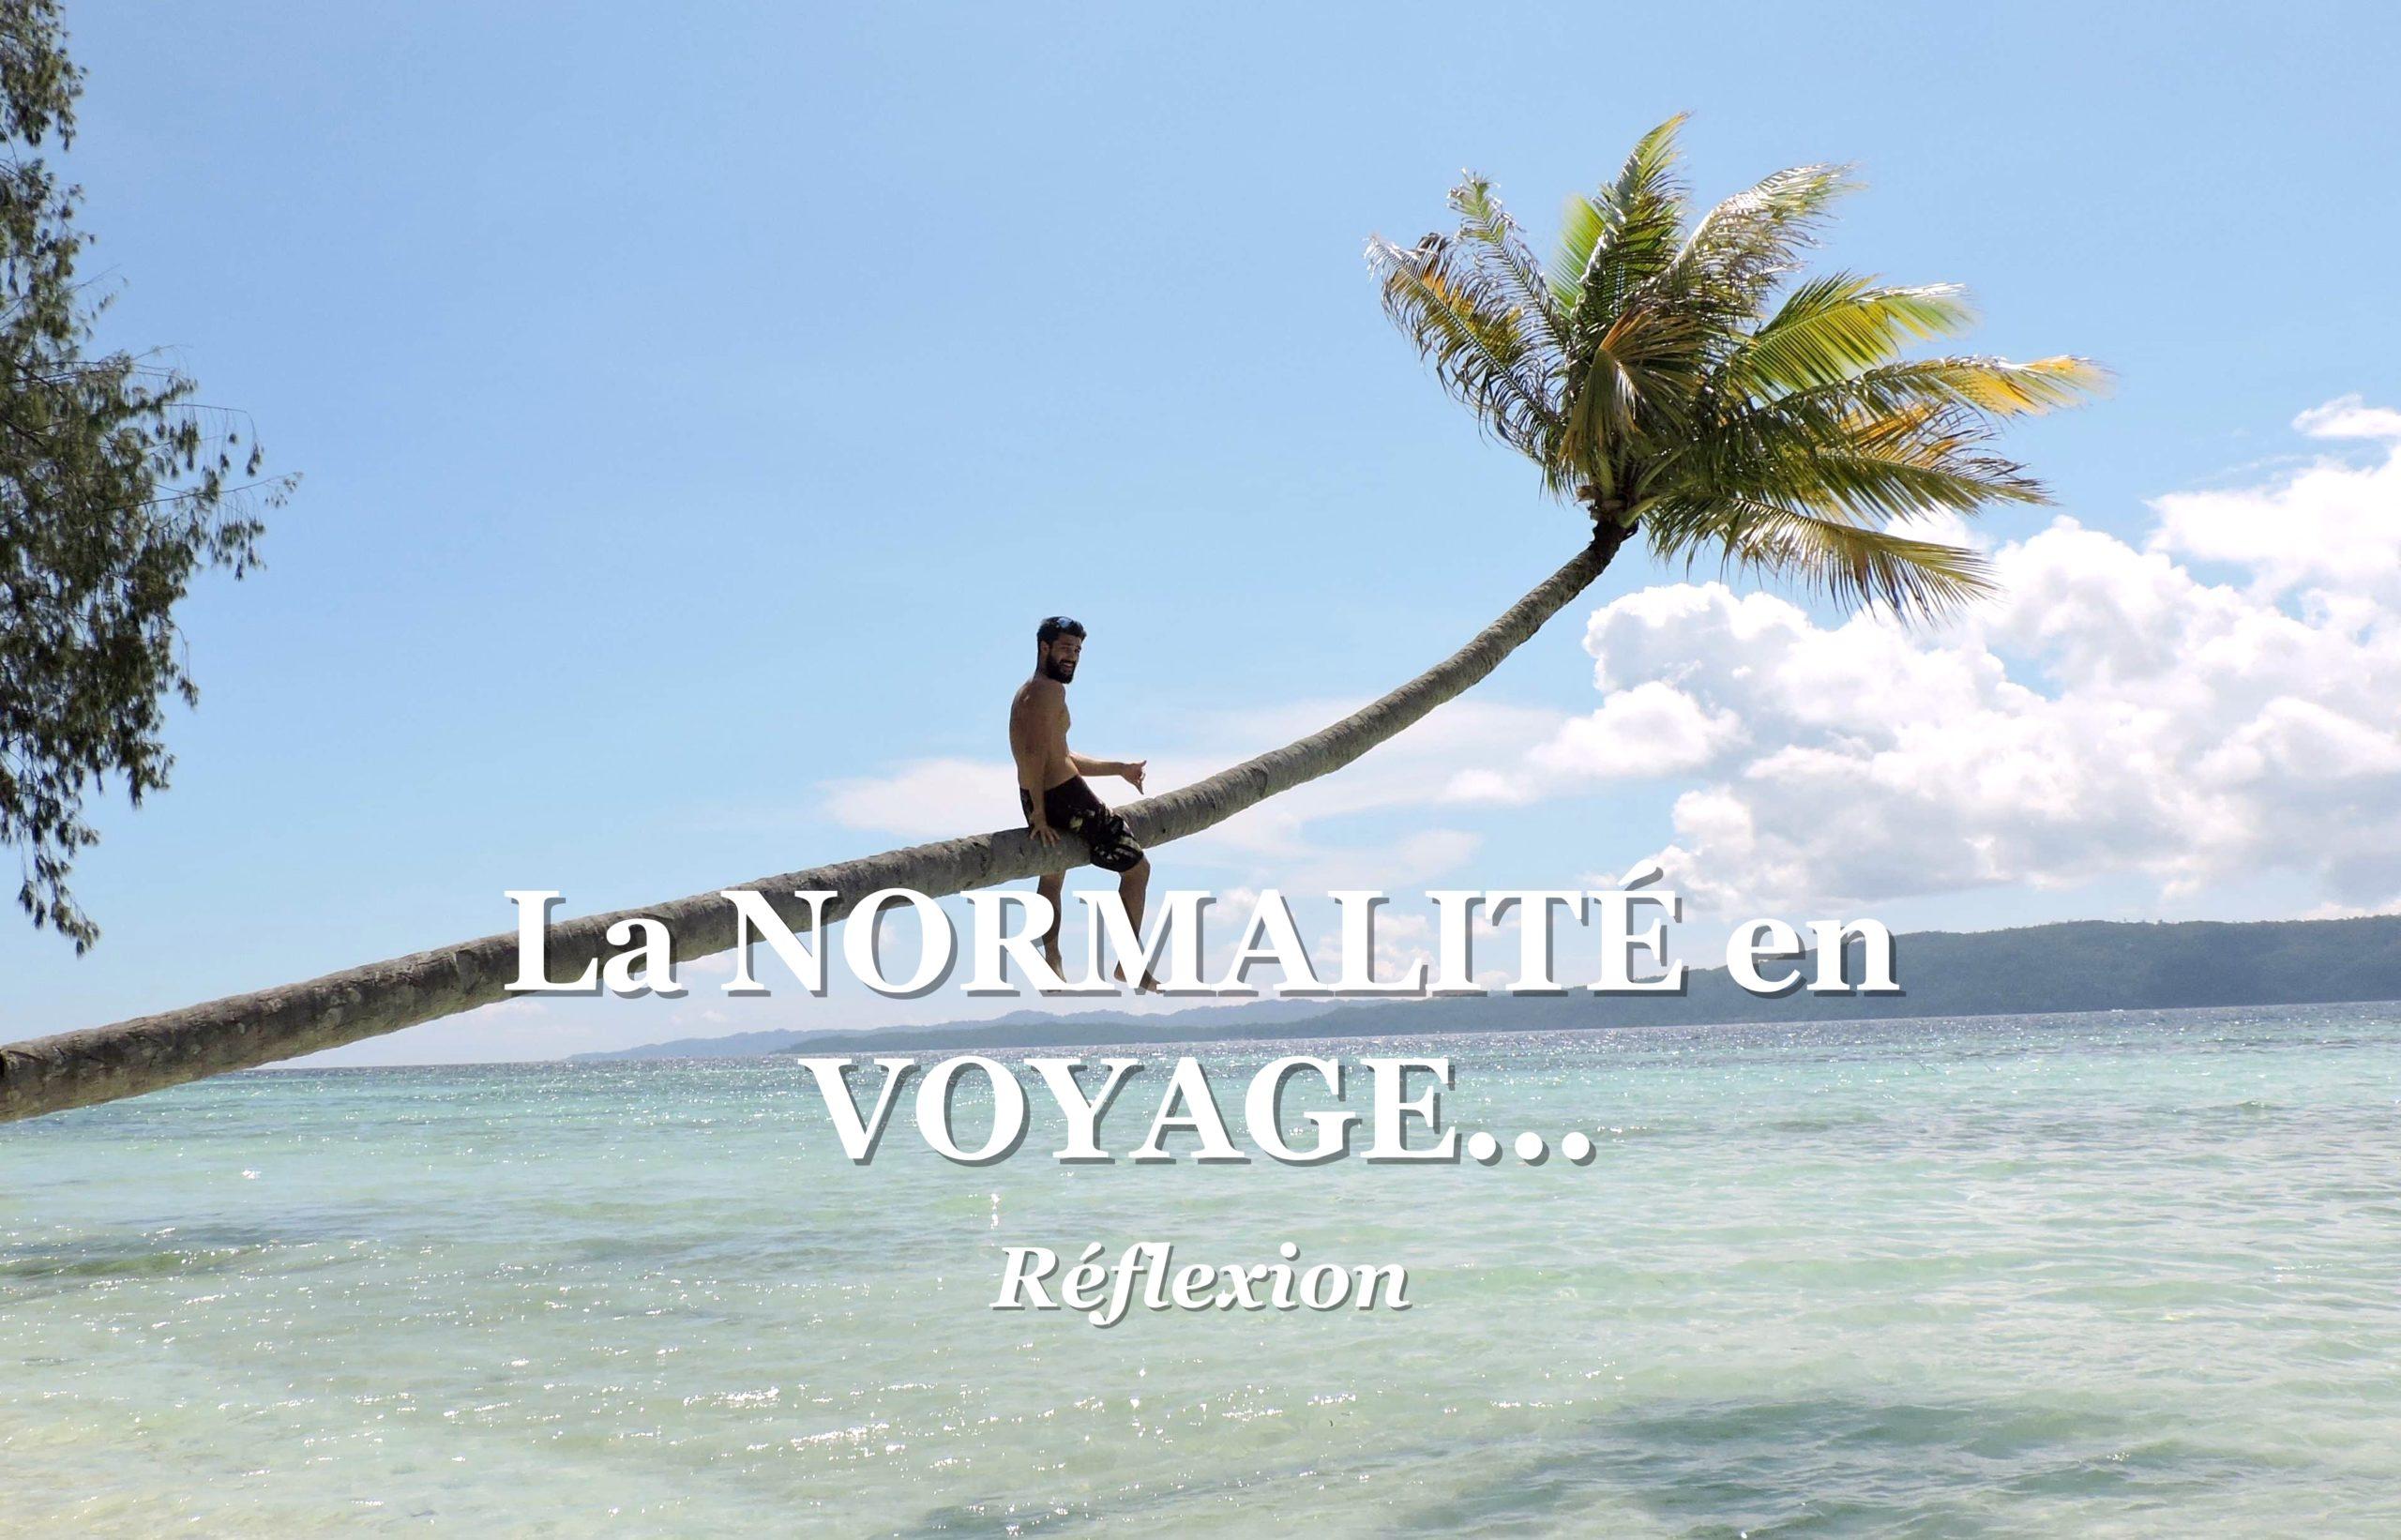 la normalité en voyage